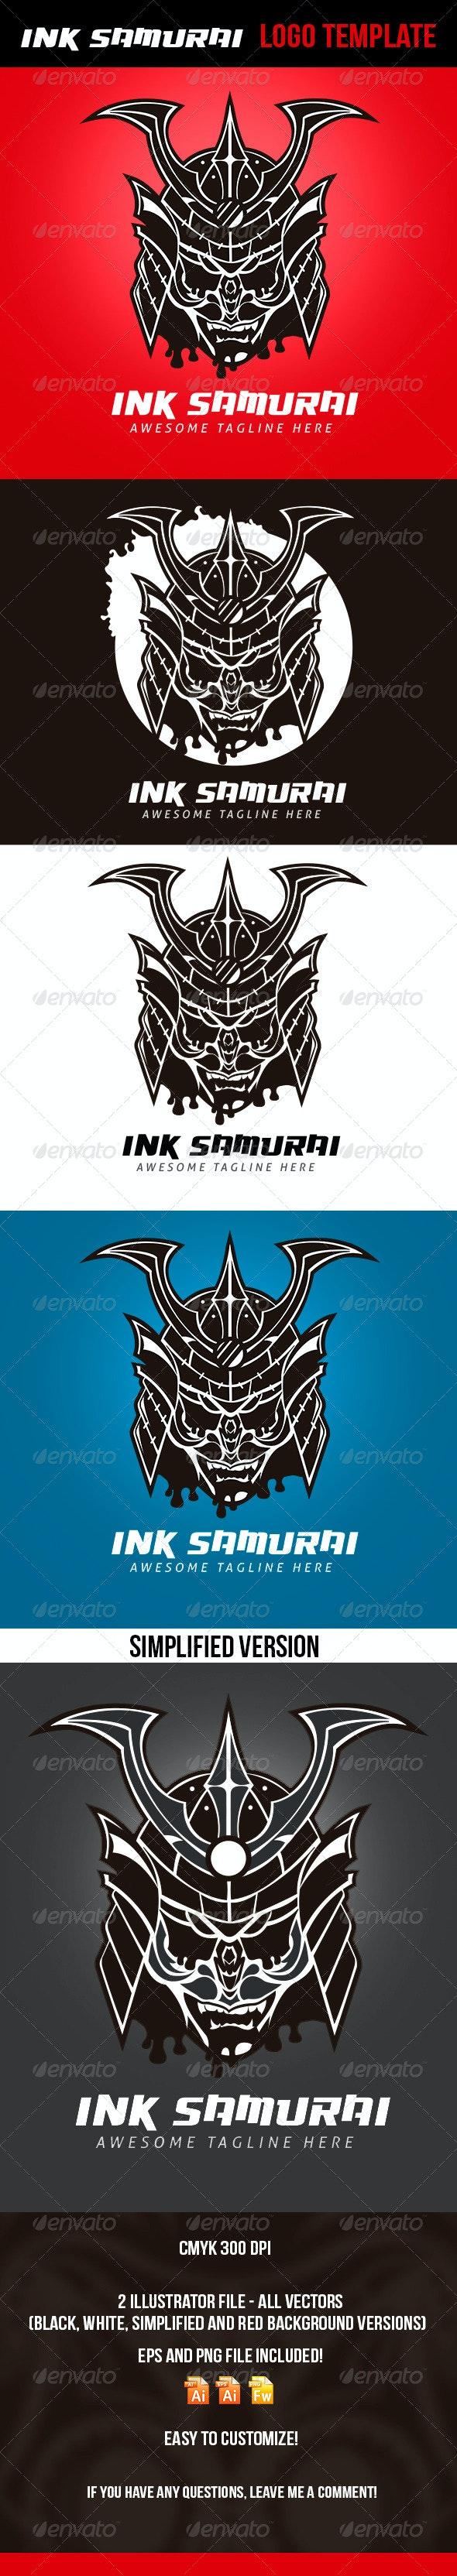 Ink Samurai Logo Template - Logo Templates